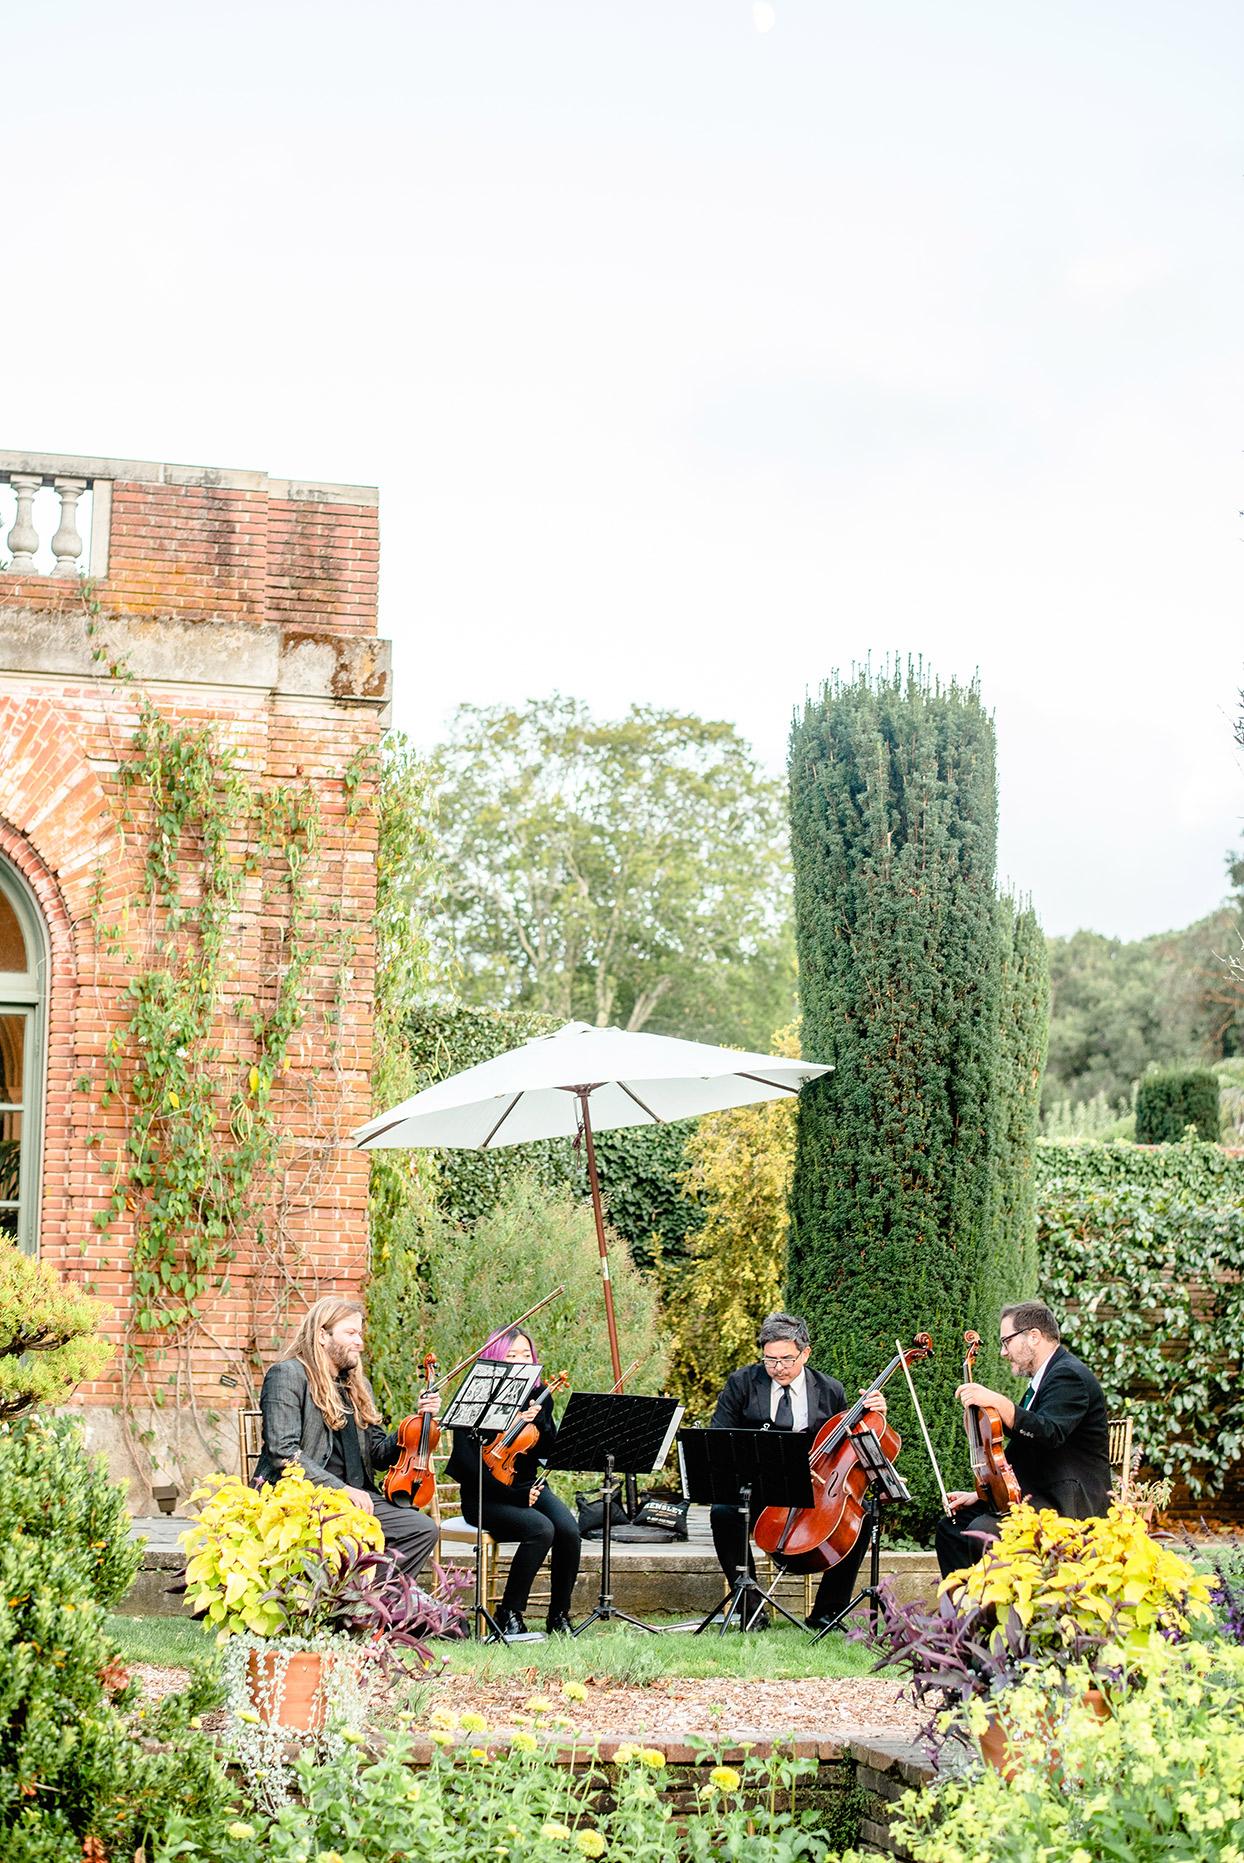 yalda anusha wedding quartet musicians sitting on lawn